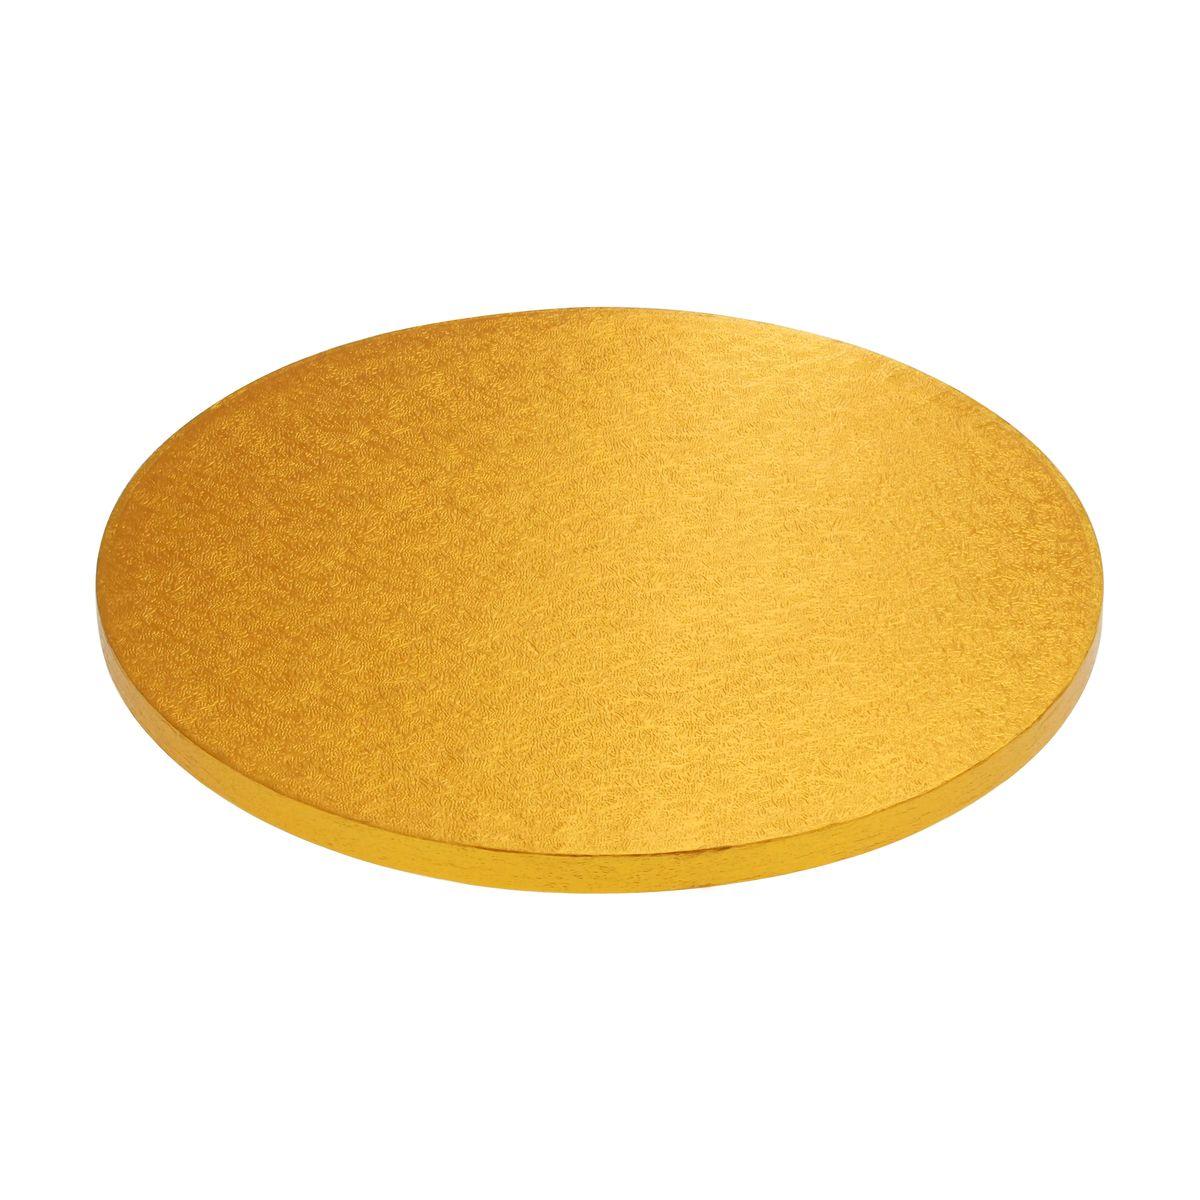 Base gâteau ronde dorée 25cm - Anniversary House